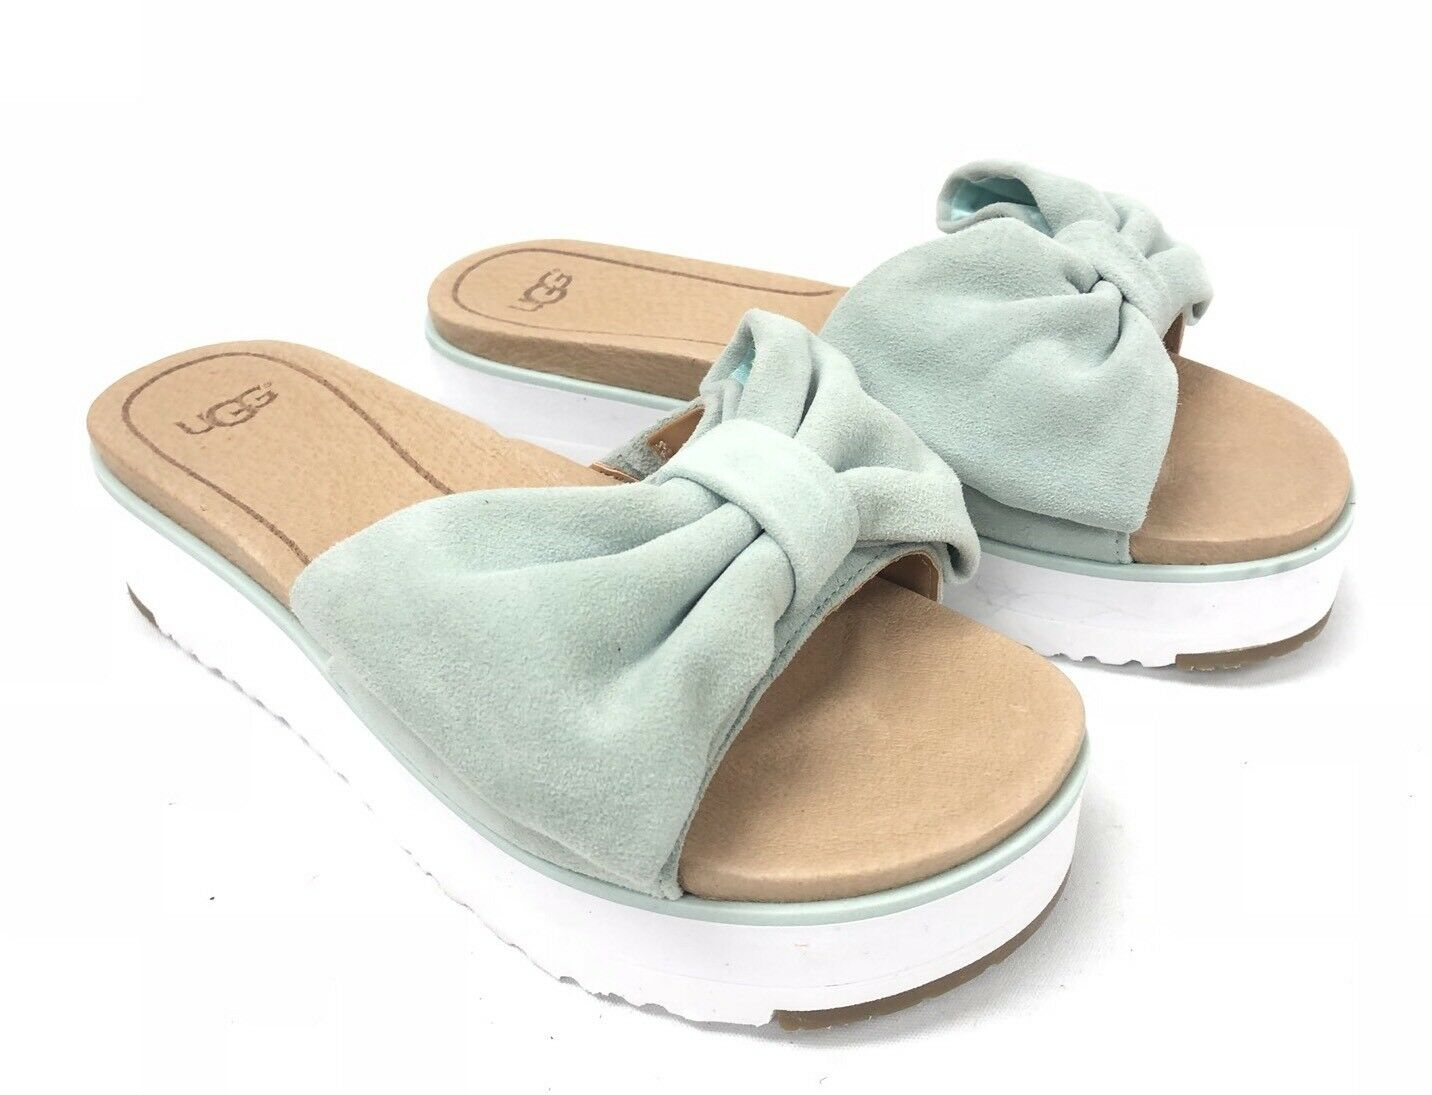 UGG Australia Joan 1019868, aqua blue, cravate, sandales, chaussures, plateforme